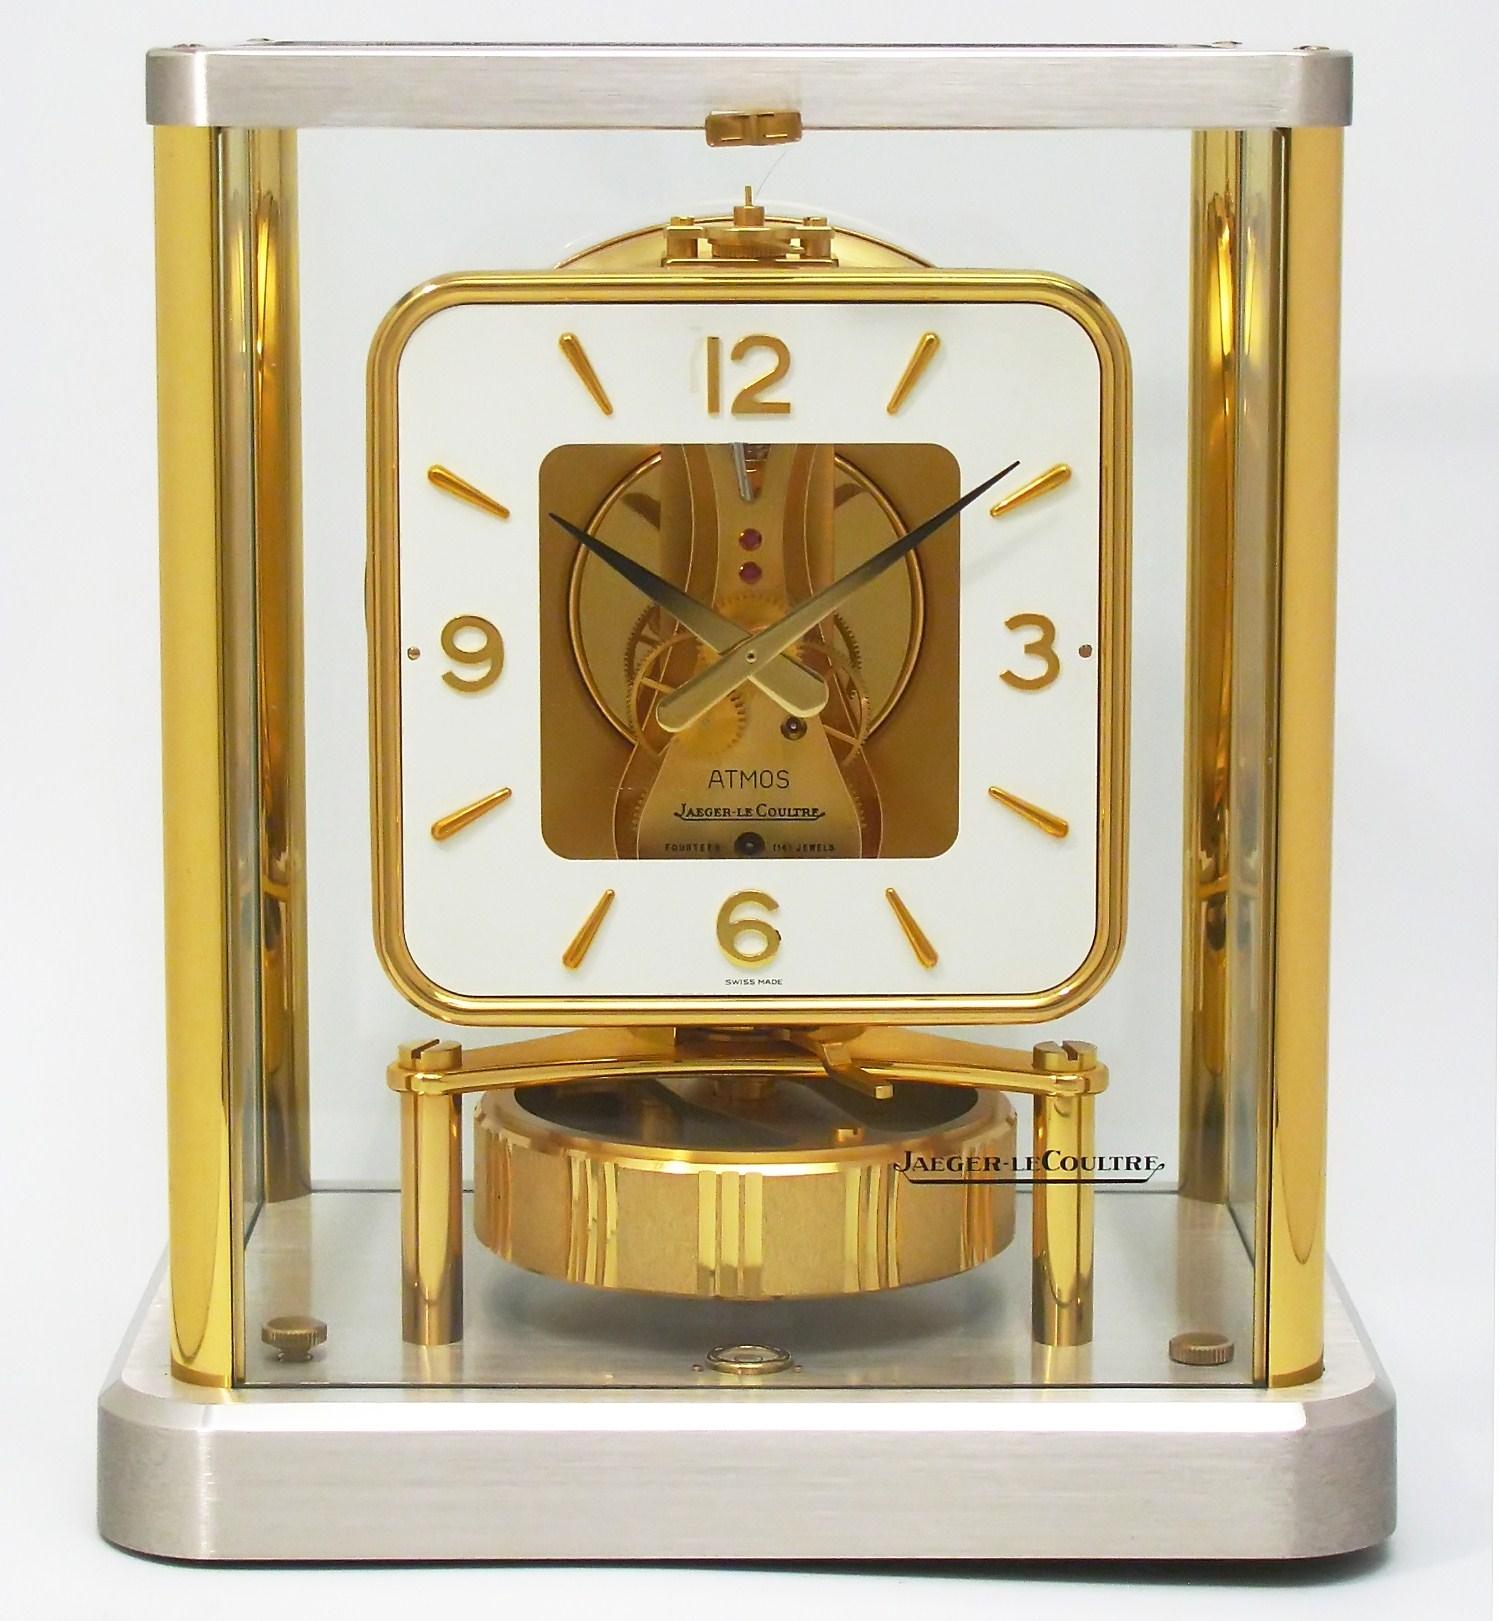 atmos-pendule-horloge-gaz-mouvement-perpetuel-art-ancien-reparation-restaurarte.jpg